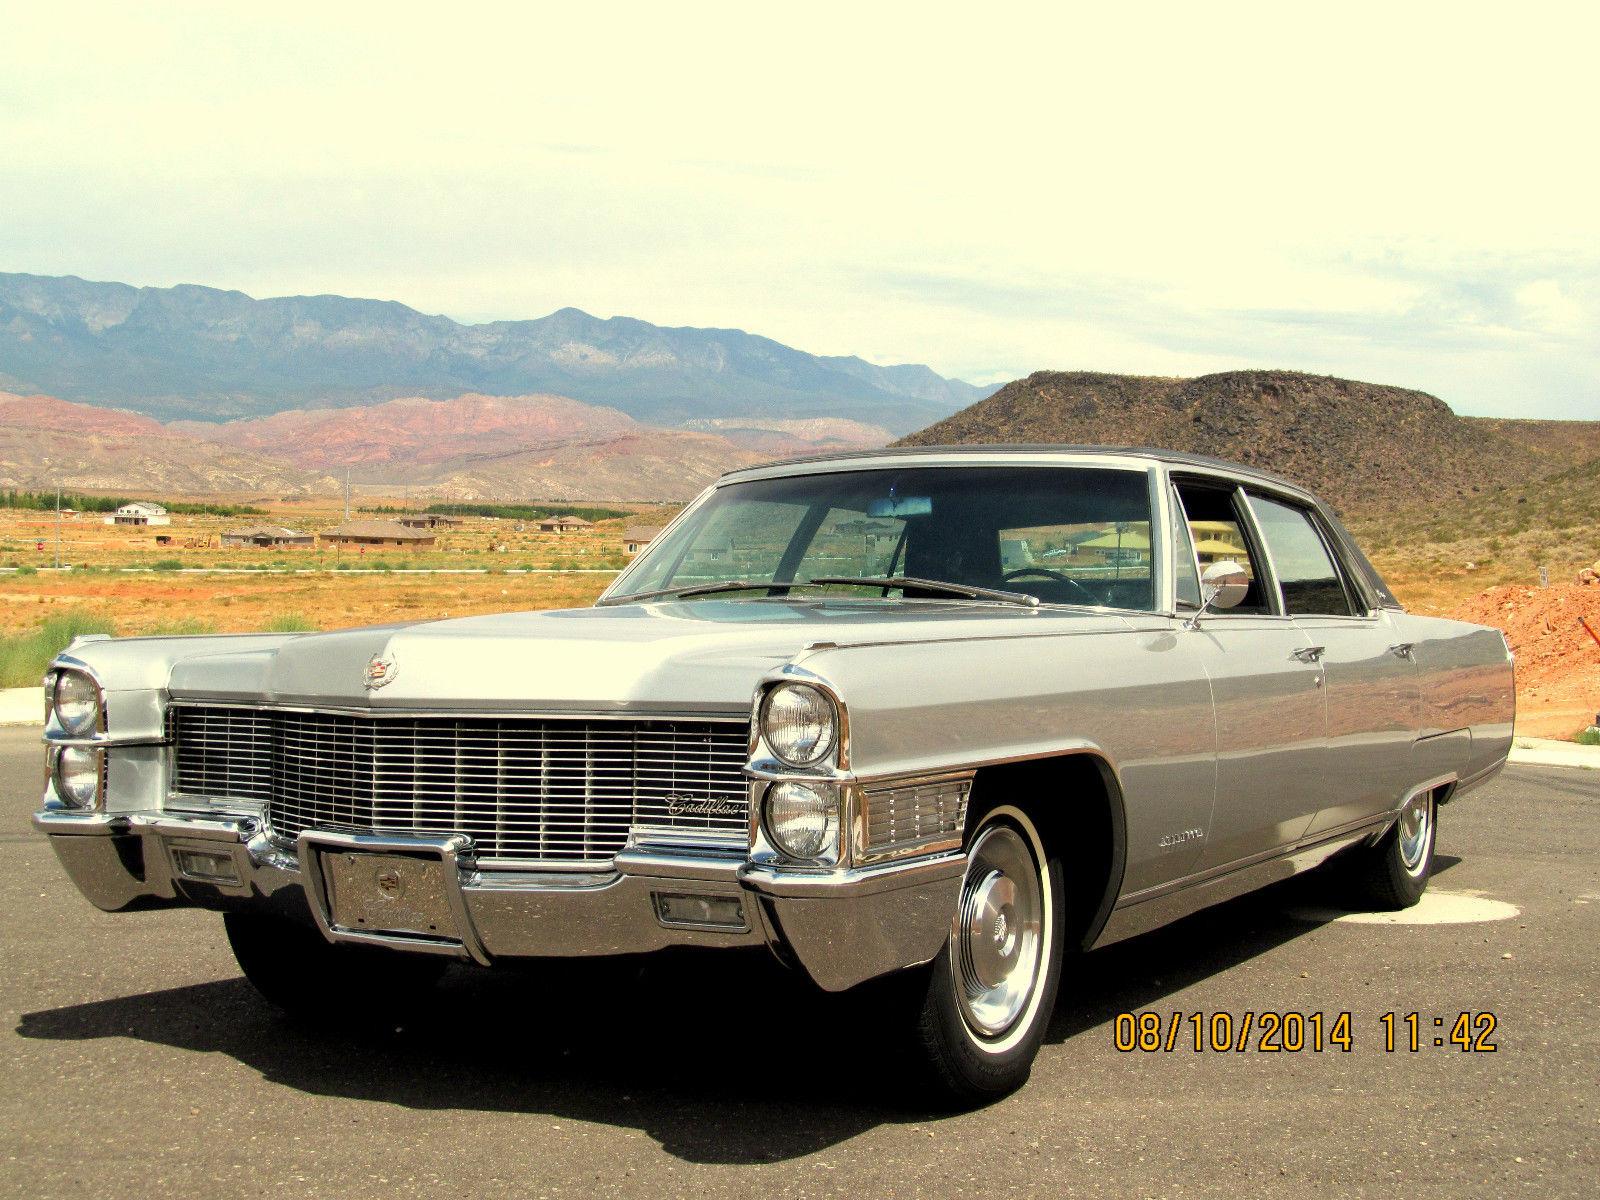 1965 Cadillac Fleetwood 60 Special Brougham Beautiful